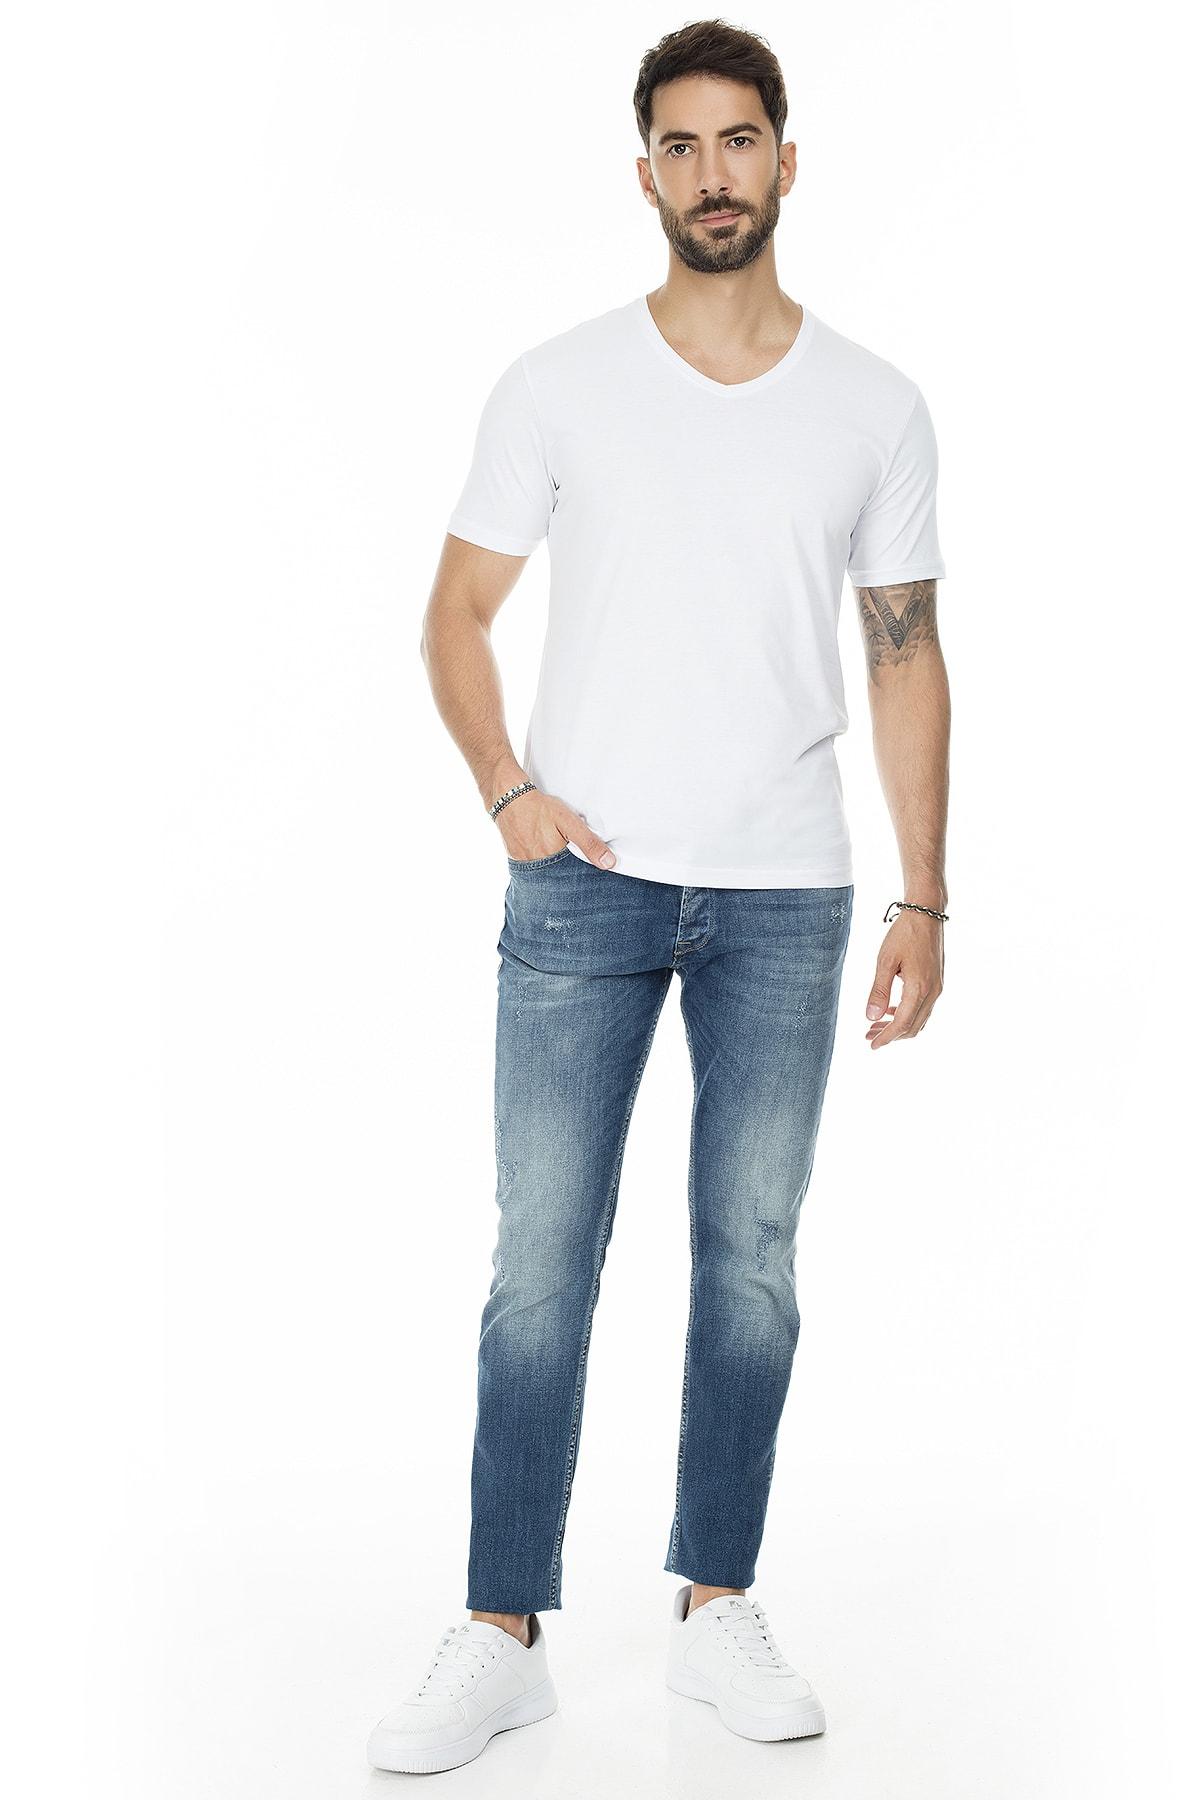 Buratti Erkek BEYAZ-BEYAZ 2'li Paket V Yaka Slim Fit Pamuklu Basic T Shirt 5722512V2 4